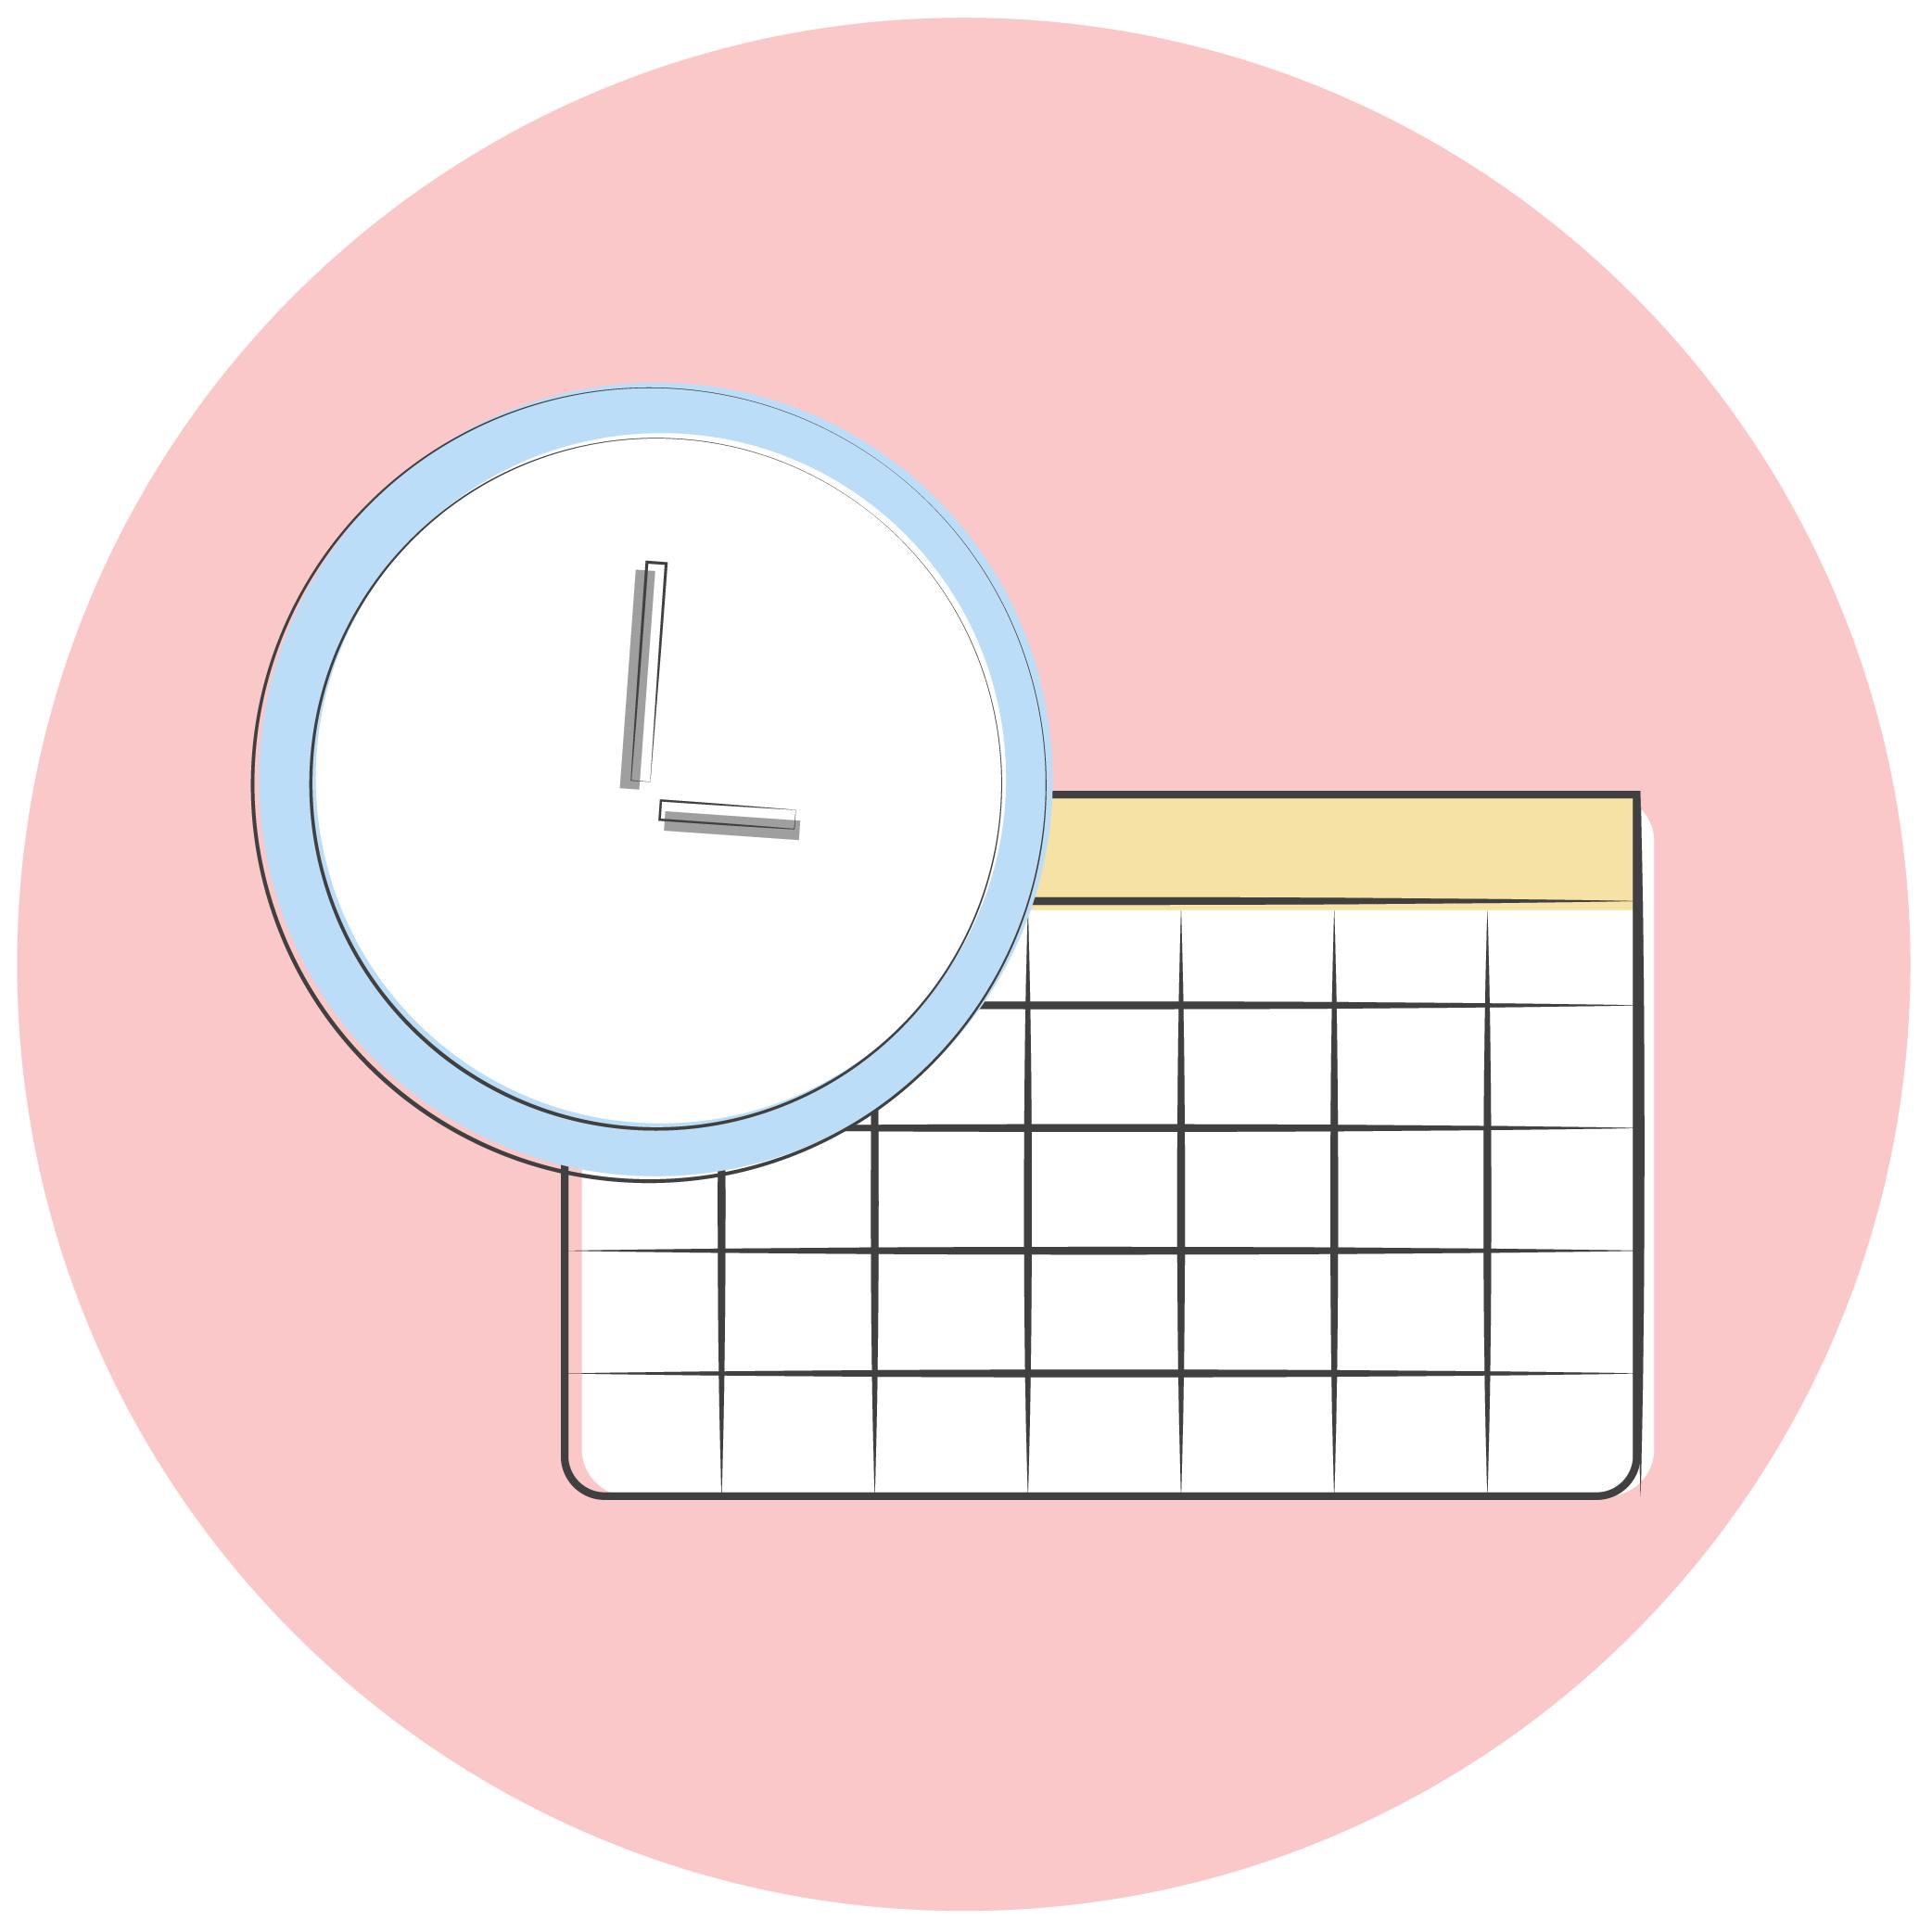 Freelance writer's calendar with a clock